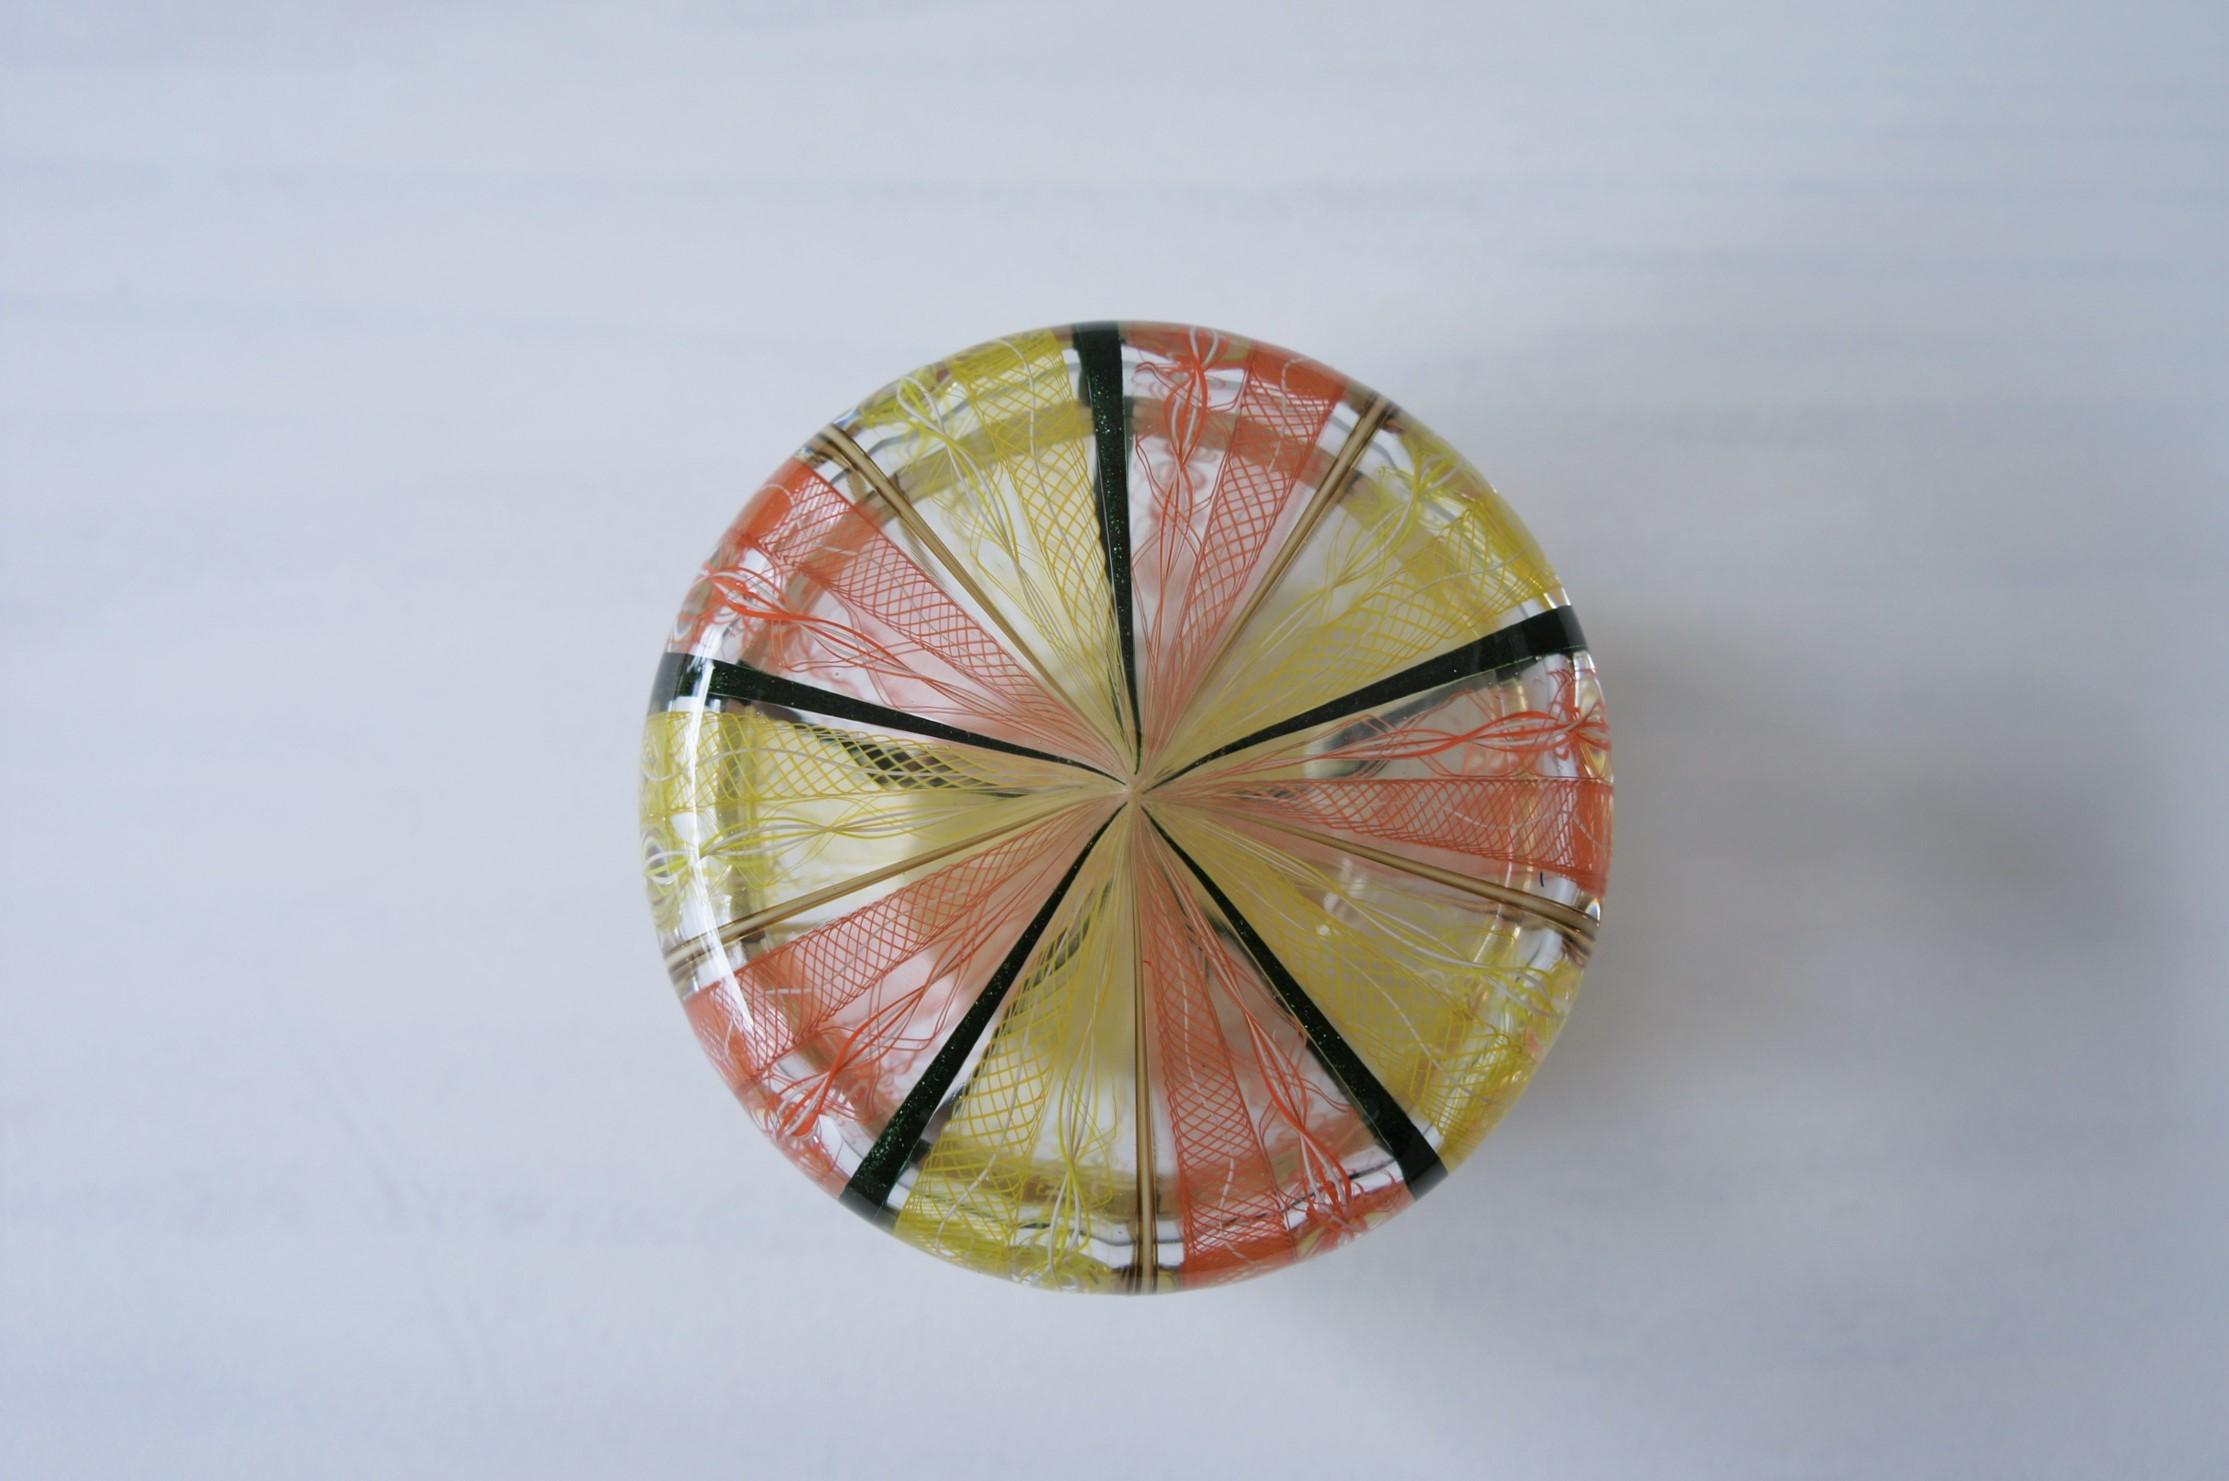 Luccichii展出品作品 小西潮さんの 橘 なつめ_b0353974_22241385.jpg